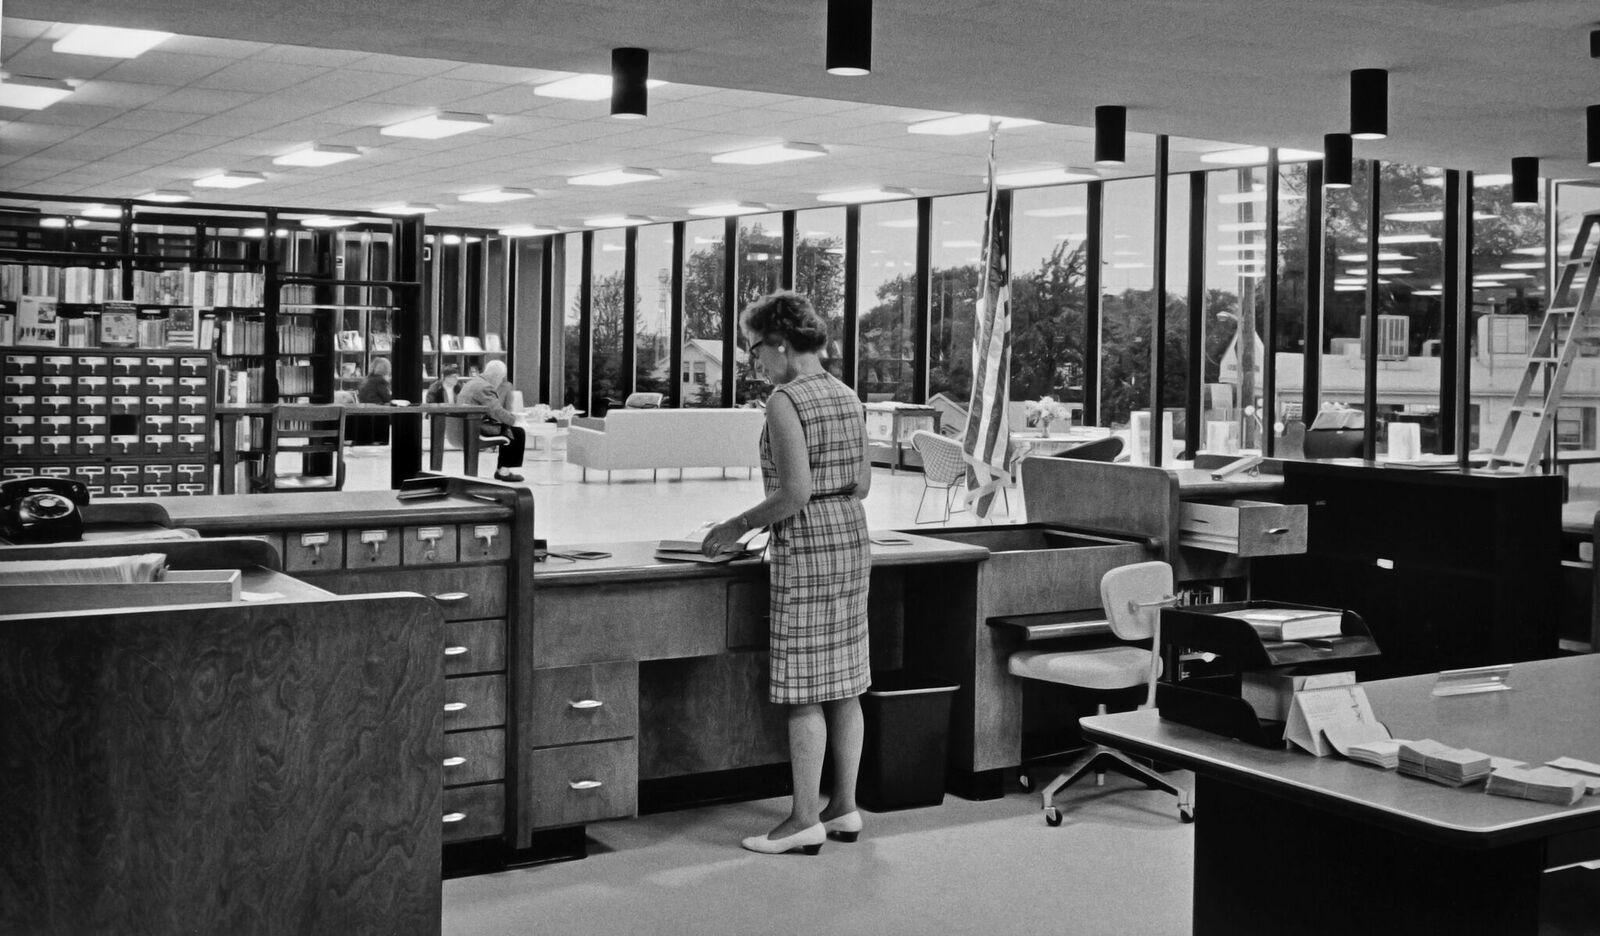 SouthPortland_Broadway_482_PublicLibary_1960s_Circulation_Desk_CHRISTOPHER_GRASSE.jpg